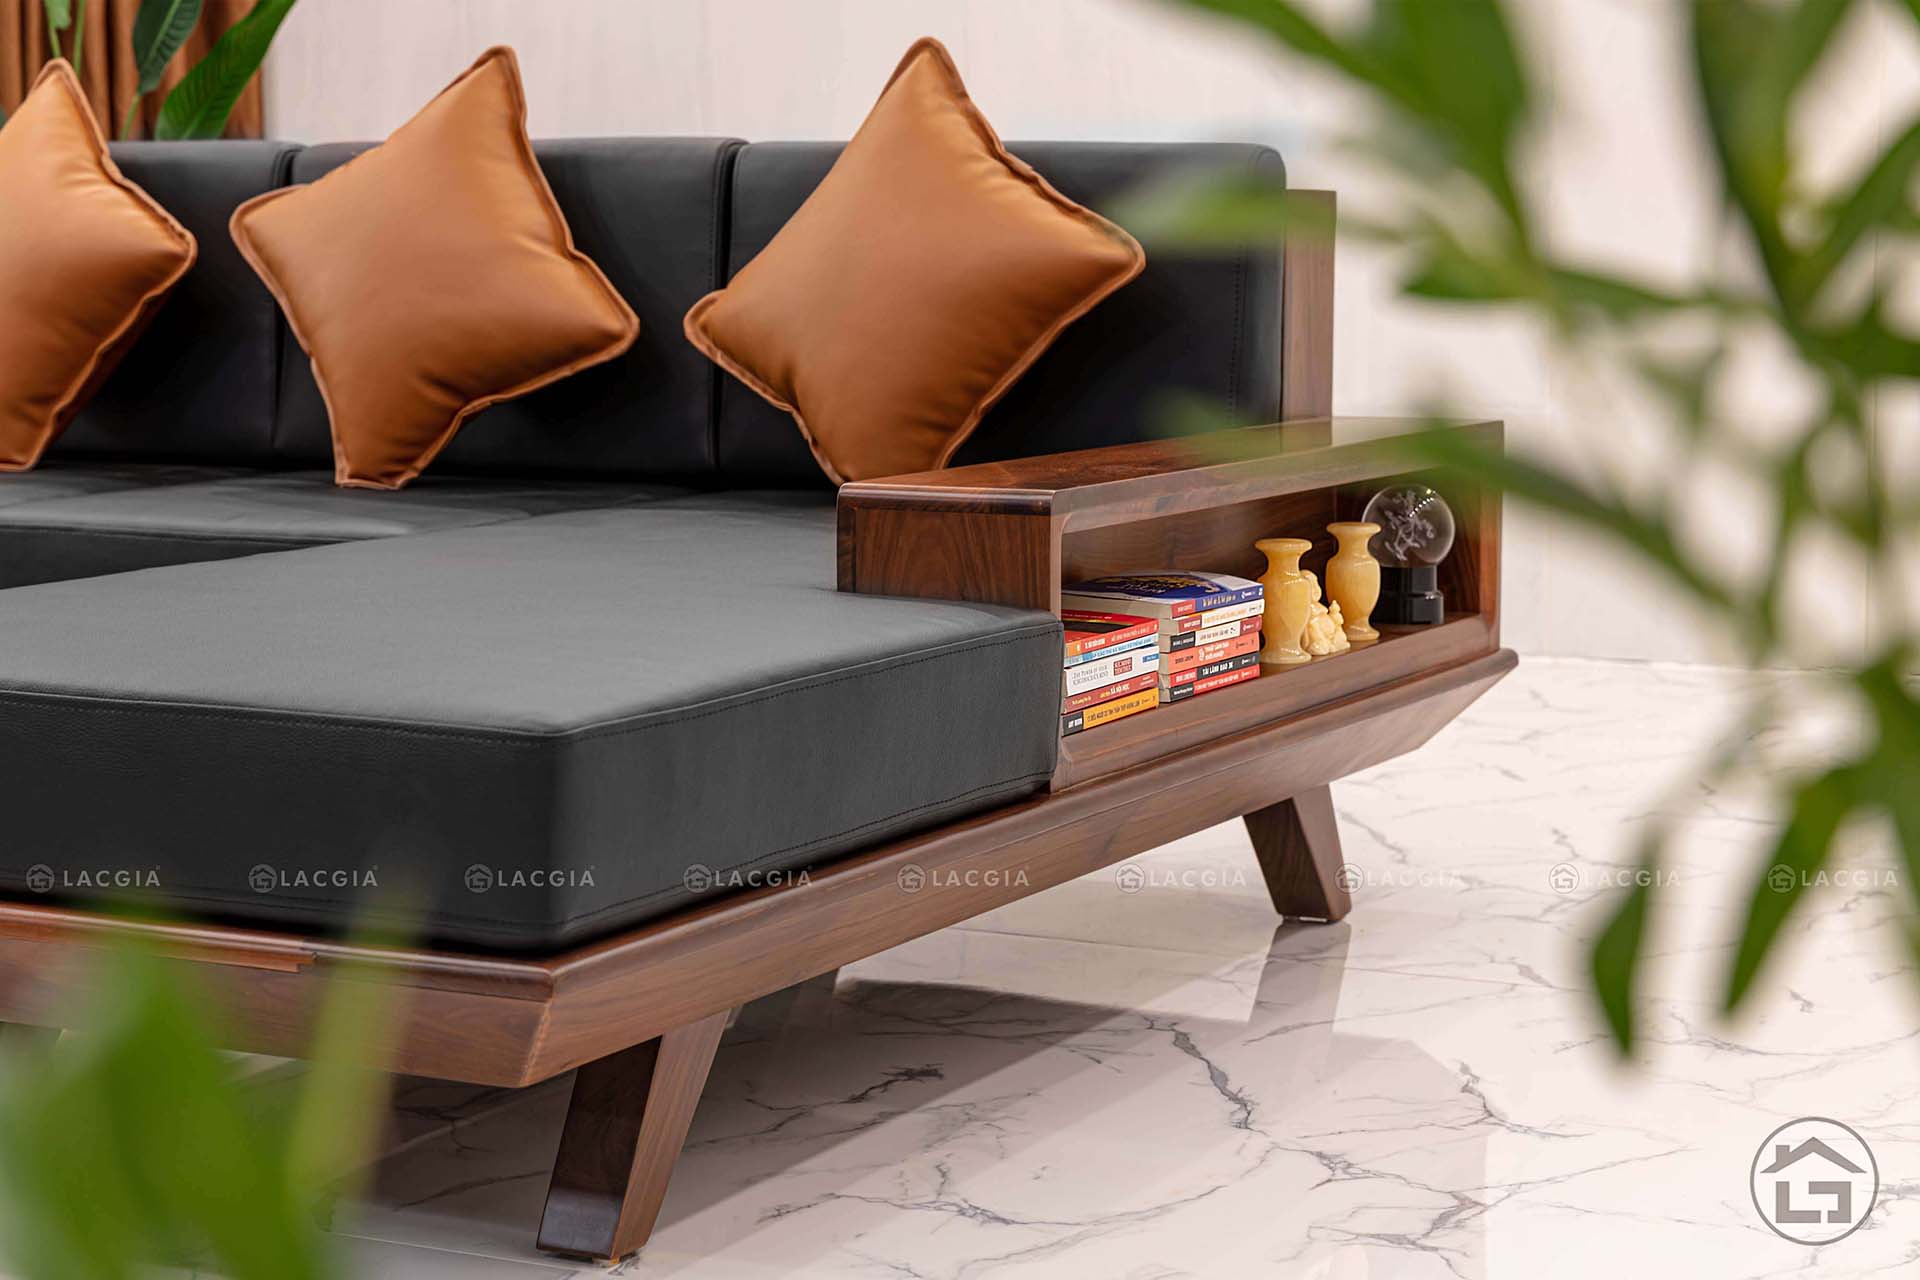 sofa go dep sf08 9 - Sofa góc có ngăn kéo SF08